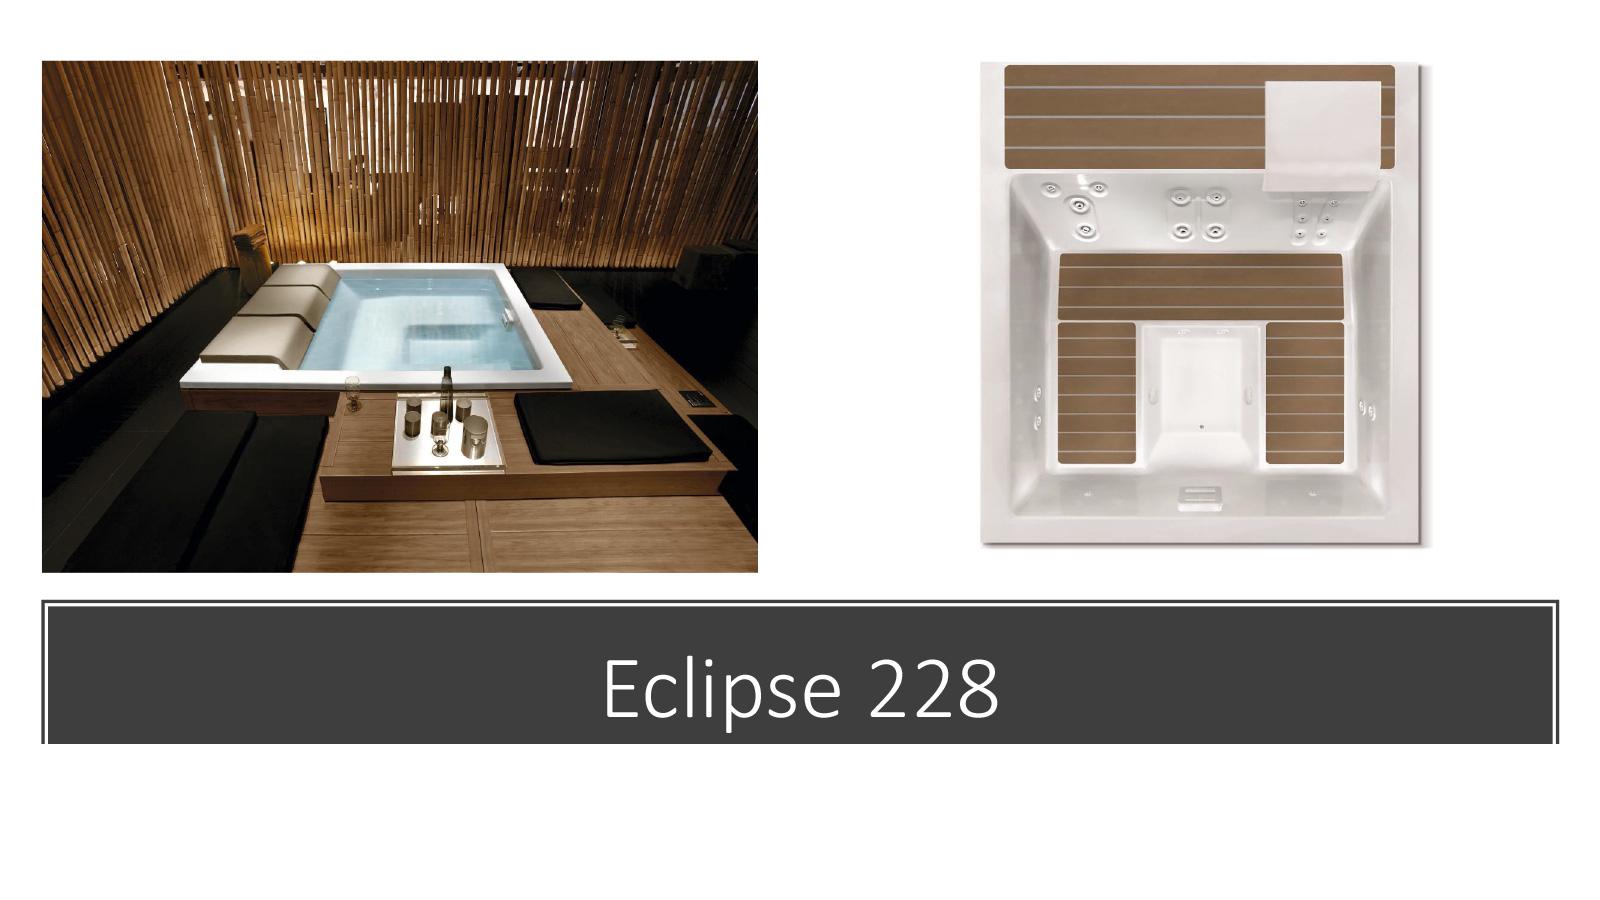 minipiscine-eclipse-228-vasca